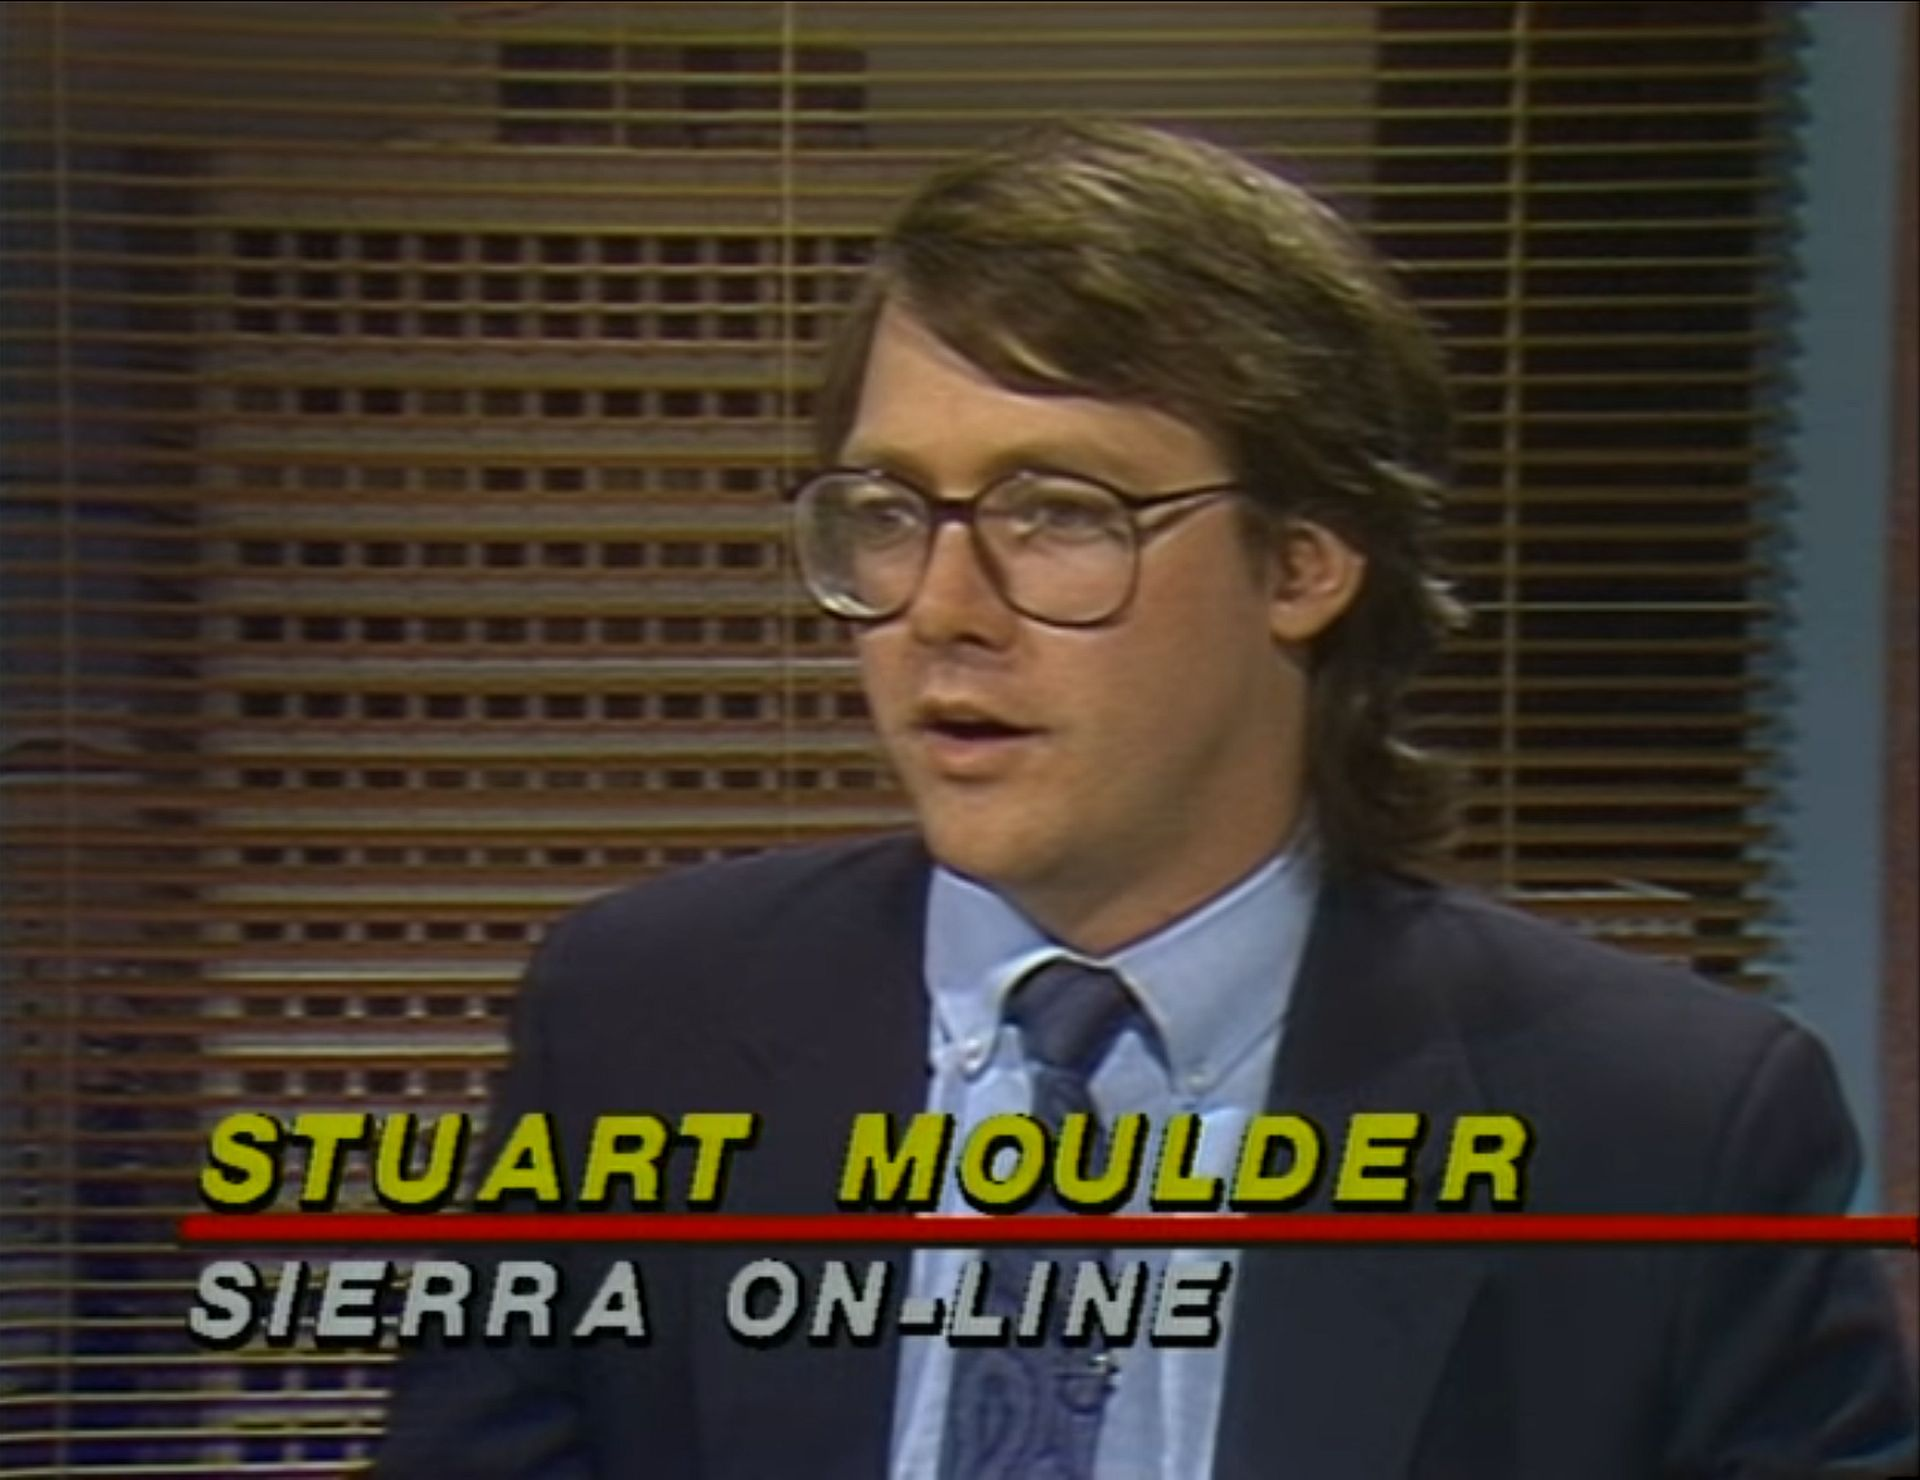 Stuart Moulder and Bruce Shelley met on the set of the same gaming-focused computer program.